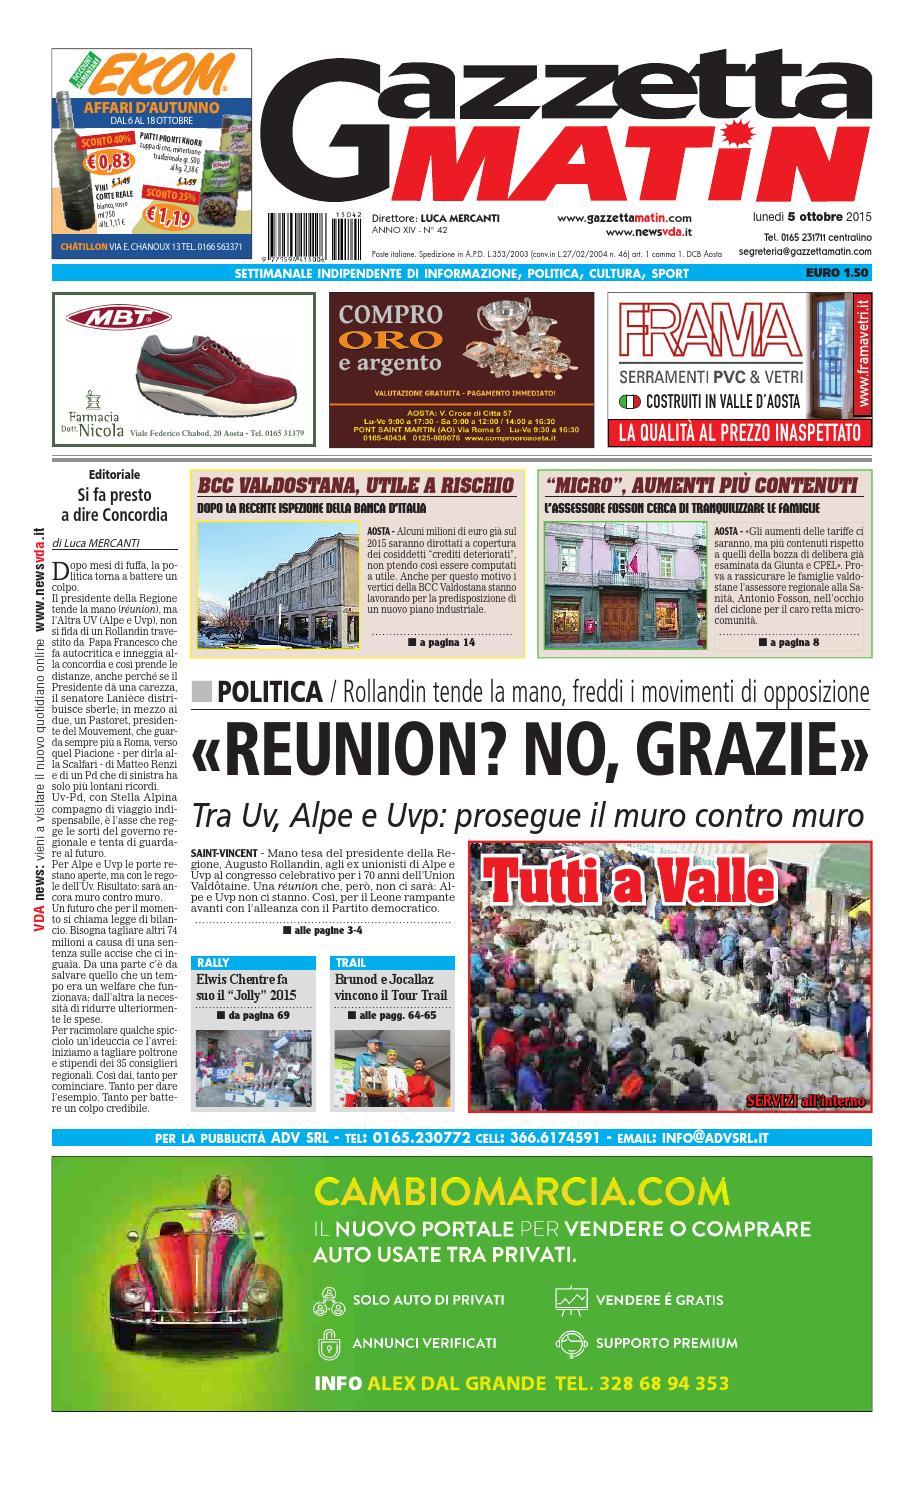 Gazzetta Matin Del 5 Ottobre 2015 By Newsvda Issuu